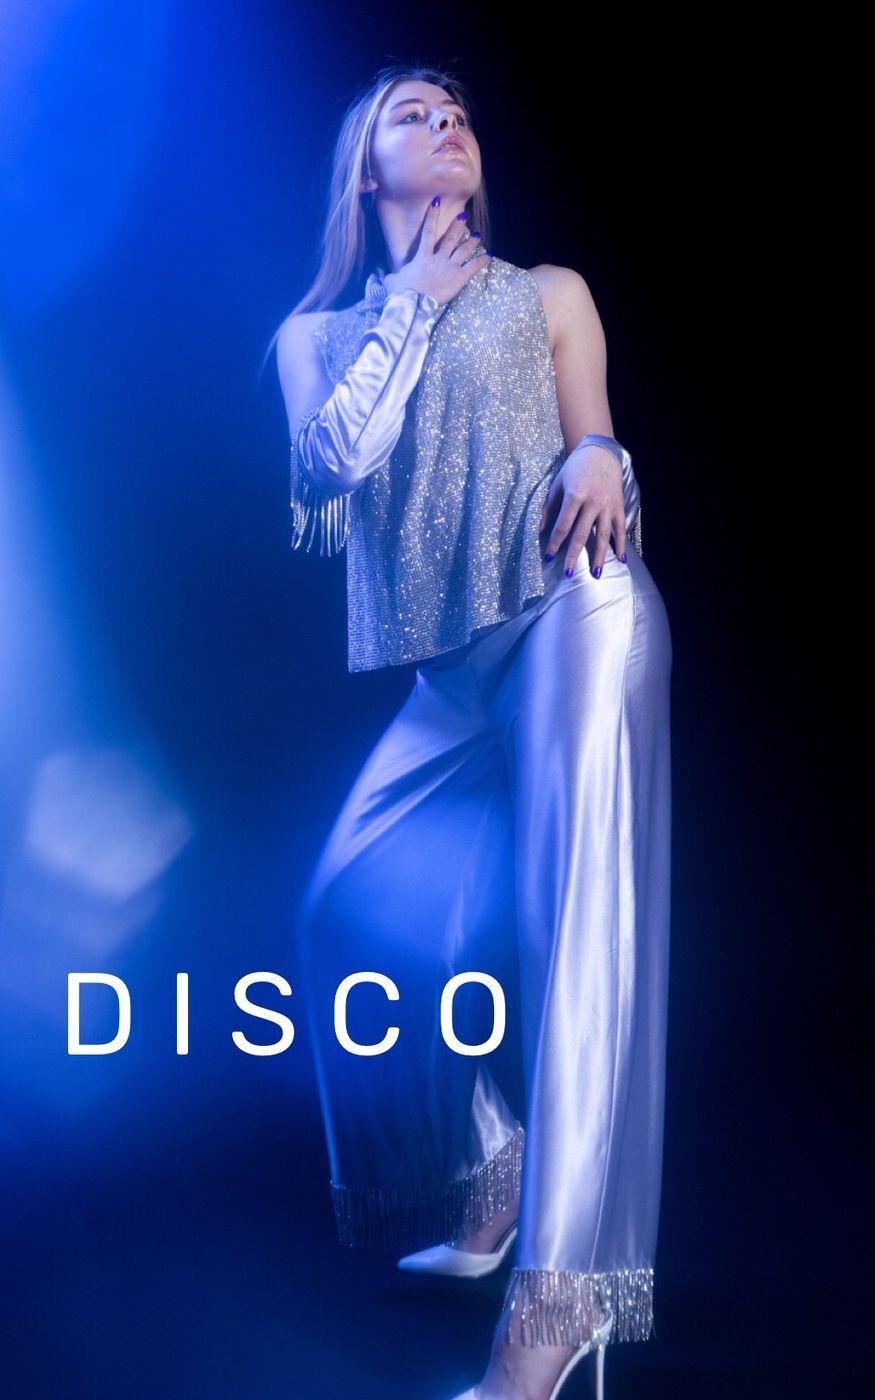 Fashion designer/AD: Sean Patrick Photographer/MUA: Rachel Zuckerberg Models: Heather Davies and Sarah Steed